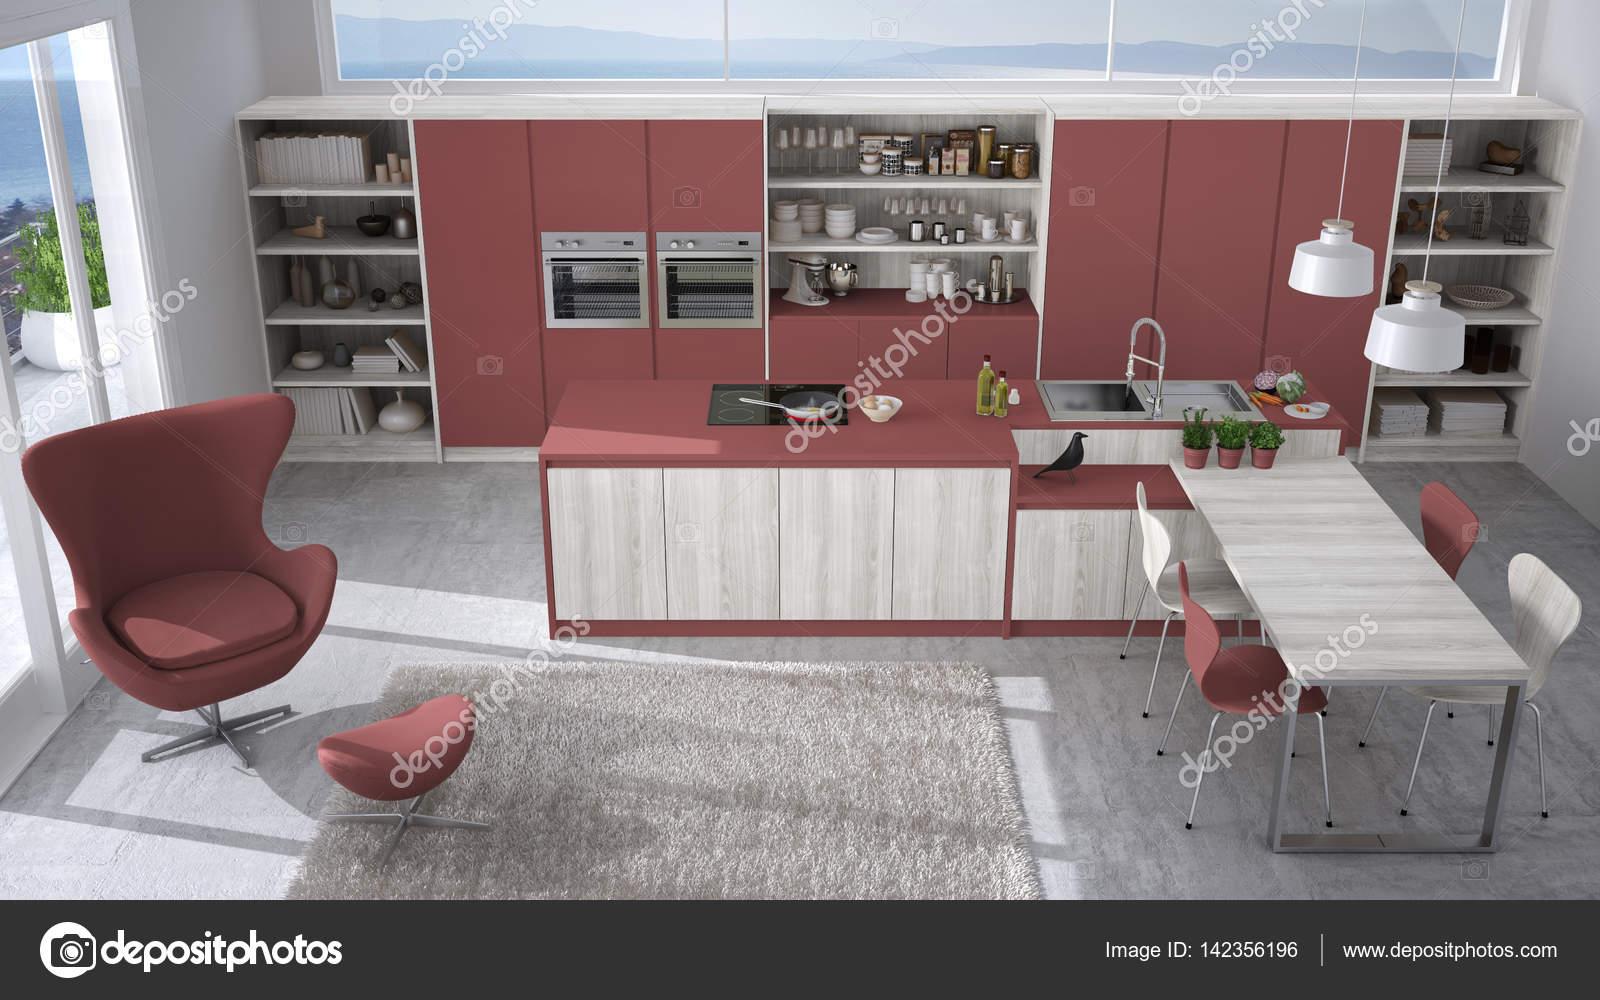 https://st3.depositphotos.com/1152281/14235/i/1600/depositphotos_142356196-stock-photo-modern-white-and-red-kitchen.jpg